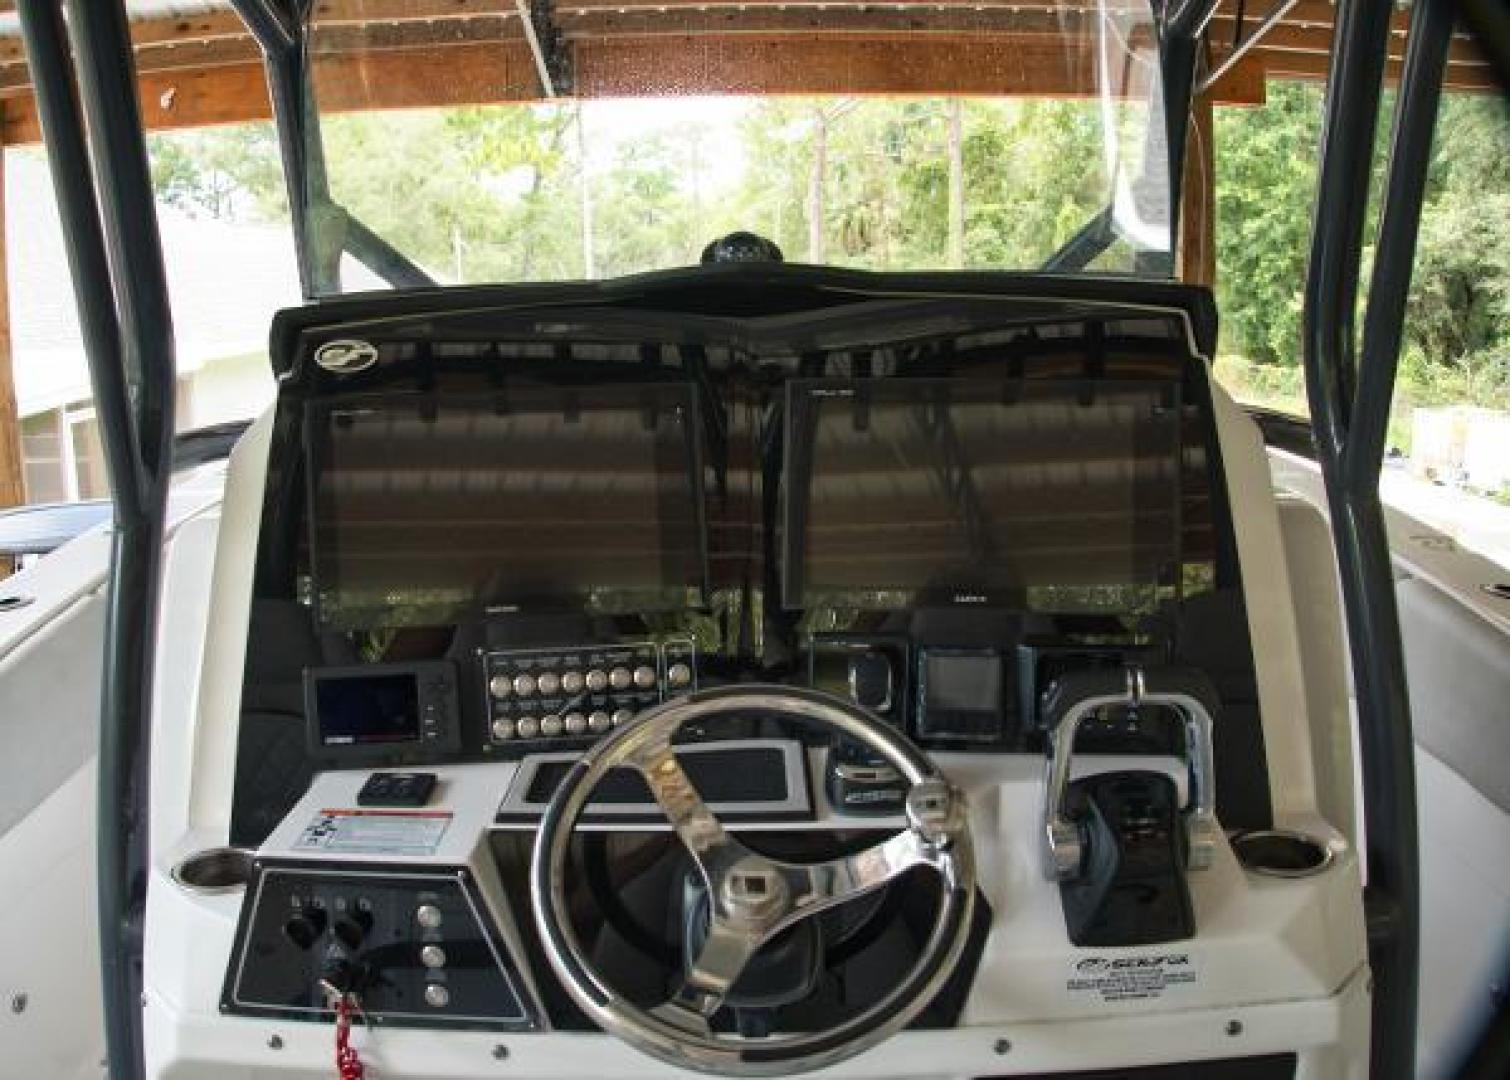 Sea Fox-328 Commander 2020-Sea Fox 328 Commander Tampa Bay-Florida-United States-1530764 | Thumbnail